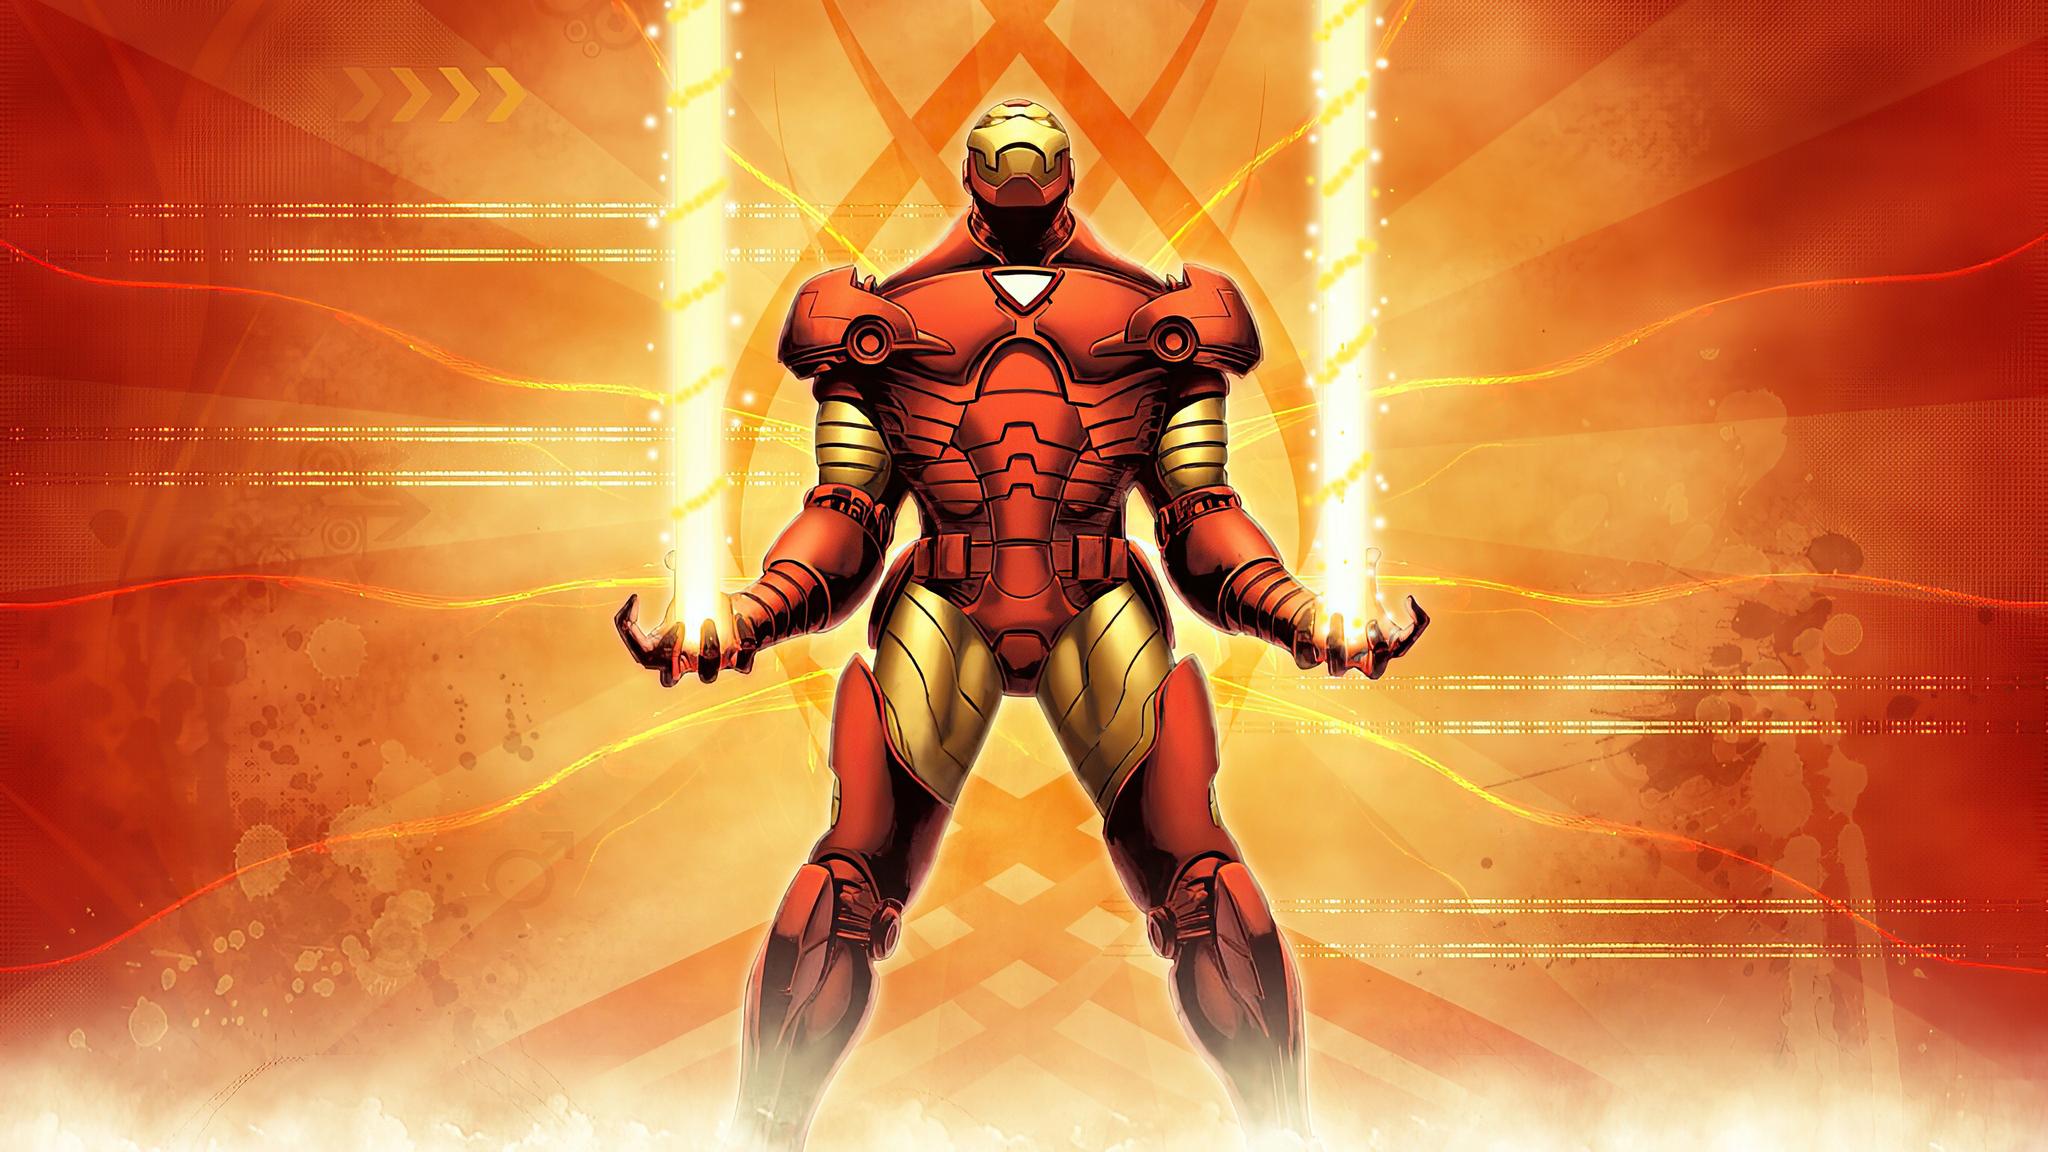 4k-iron-man-2020-art-r3.jpg